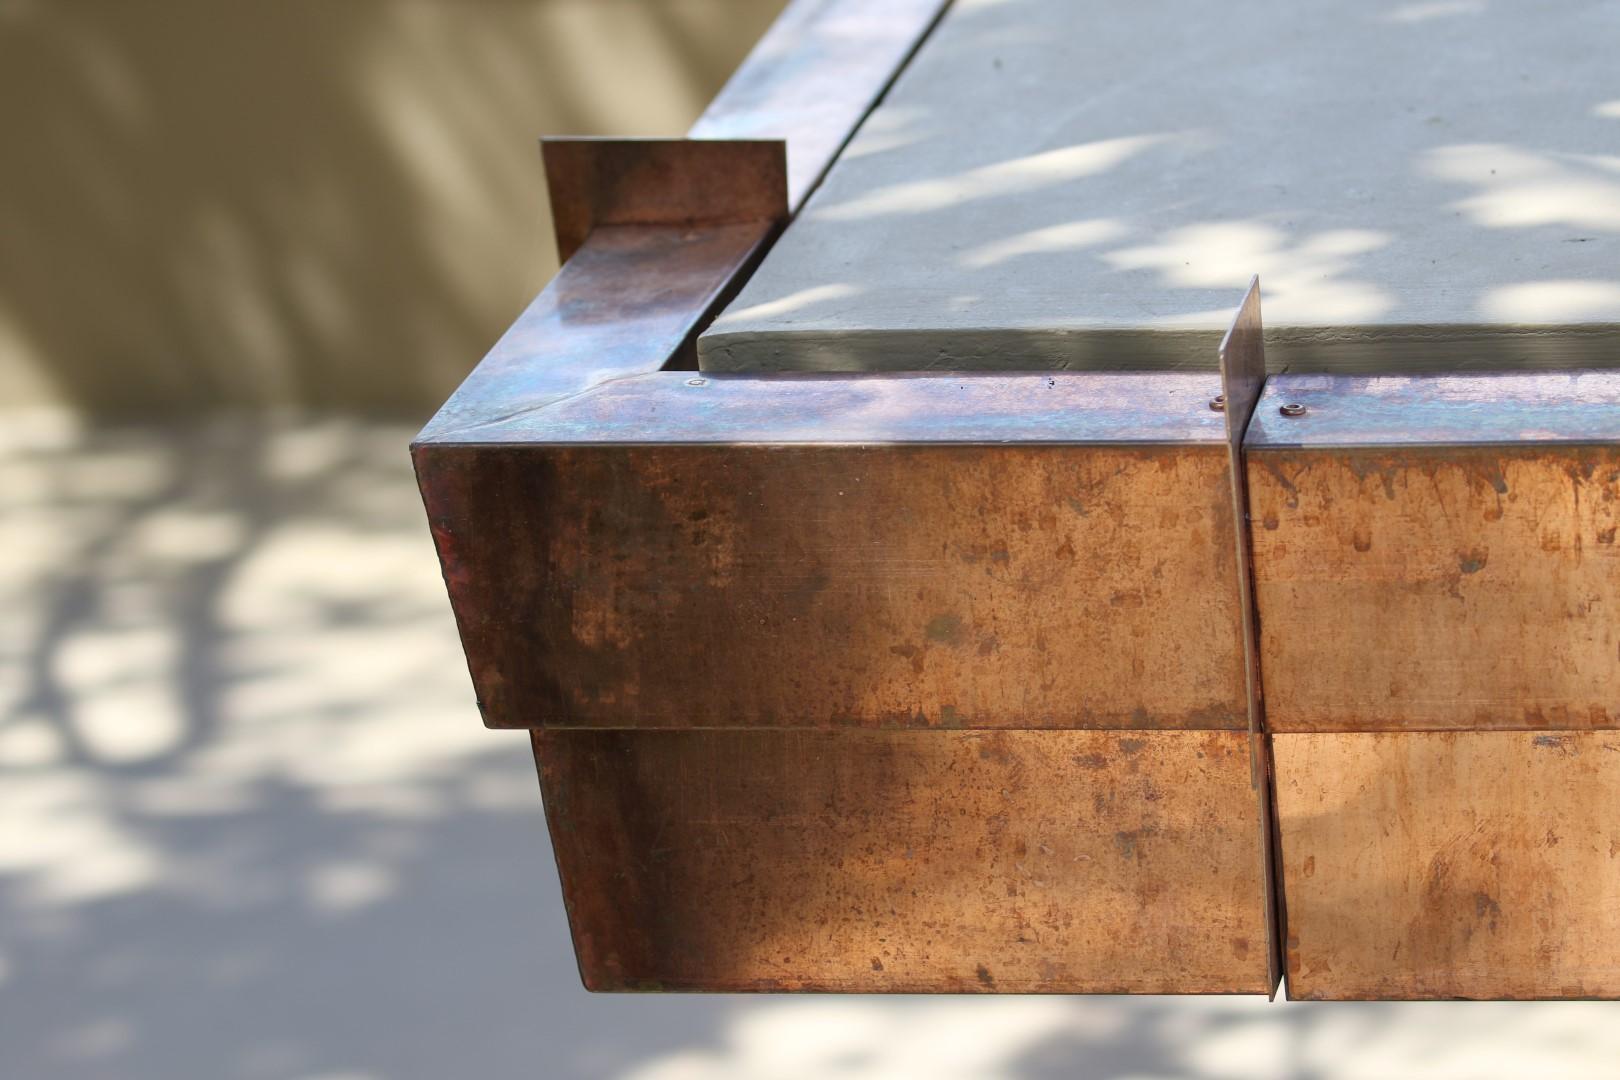 Copper fascias and soffits